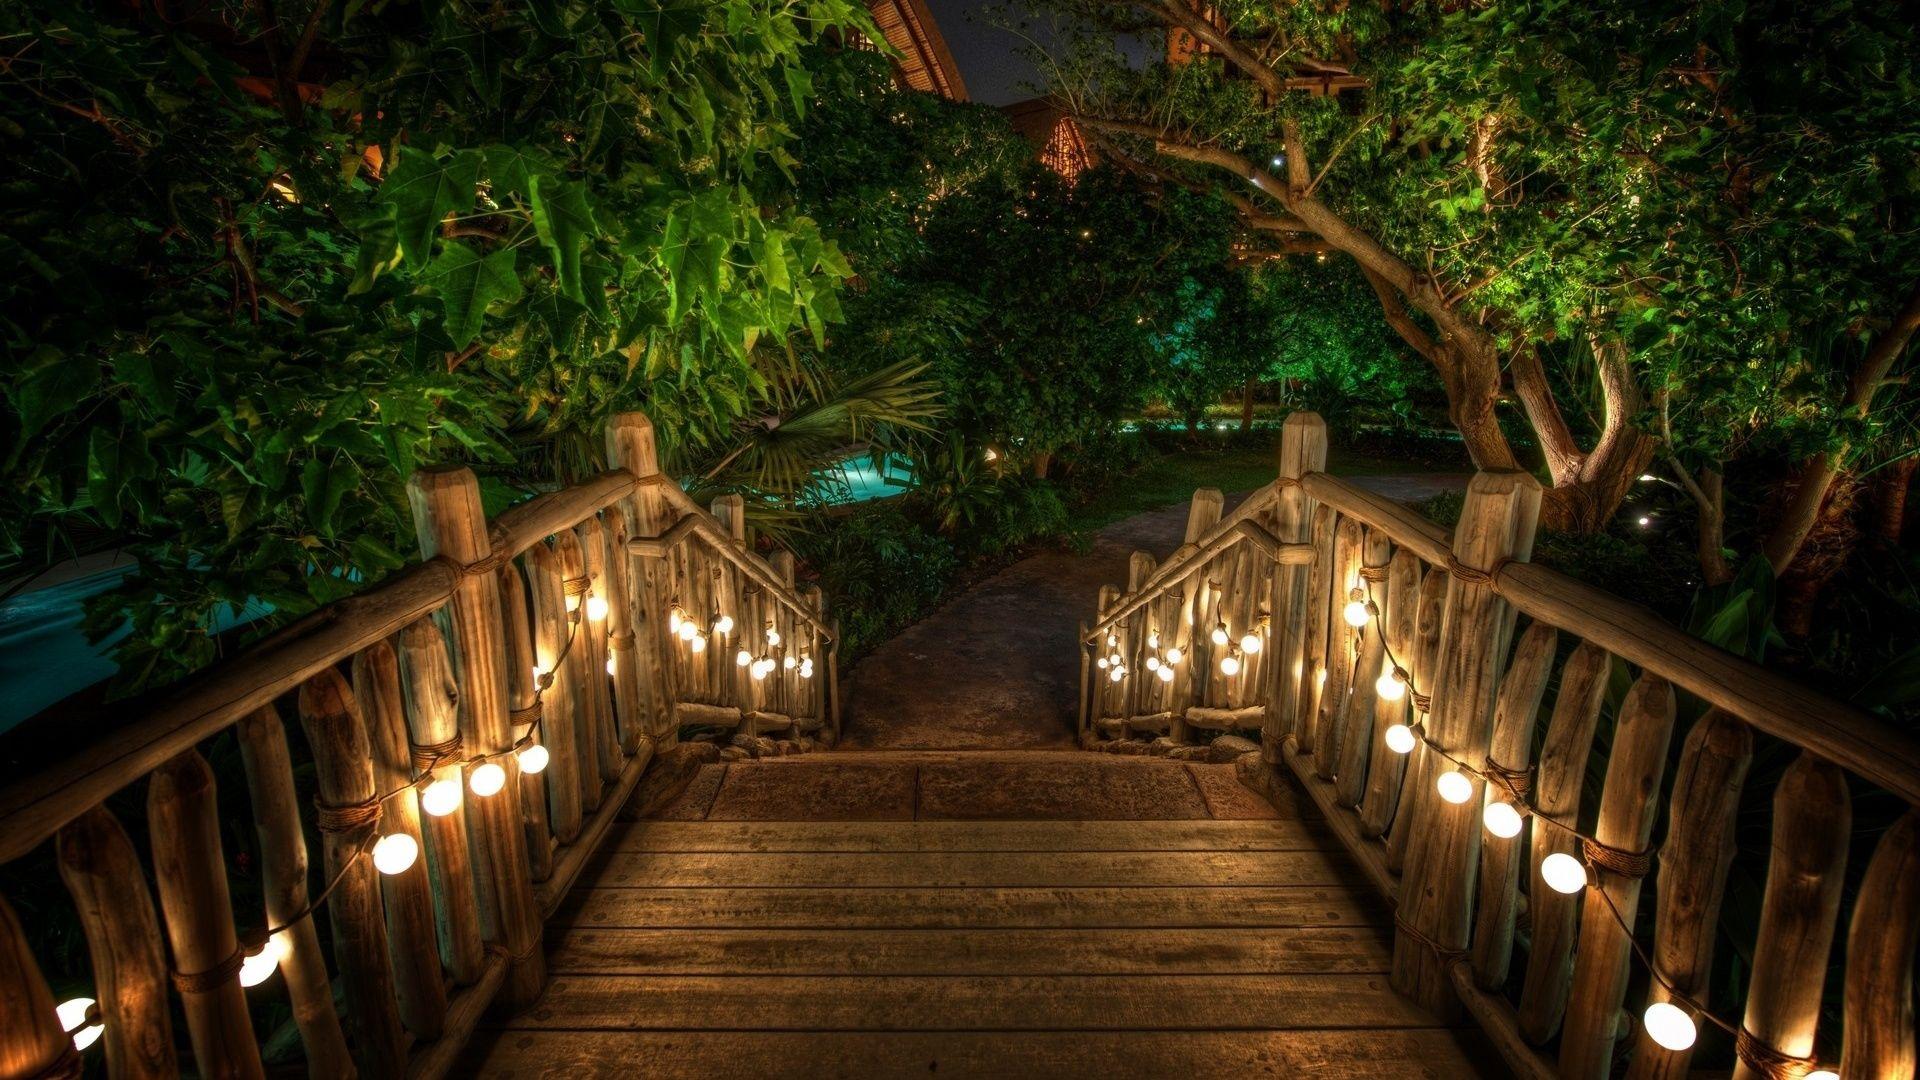 Wooden Fairy Bridge Photo